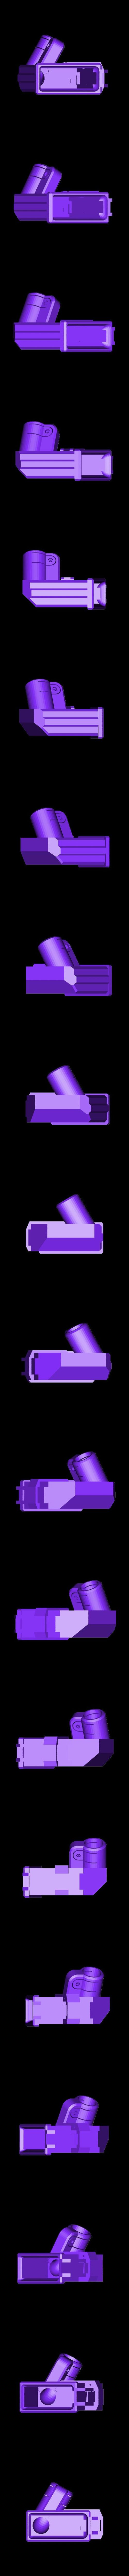 T15_magwell_PUMP_M2.stl Download free STL file T15 Mag Adapter Maverick, Trracer pump paintball • 3D printer design, UntangleART